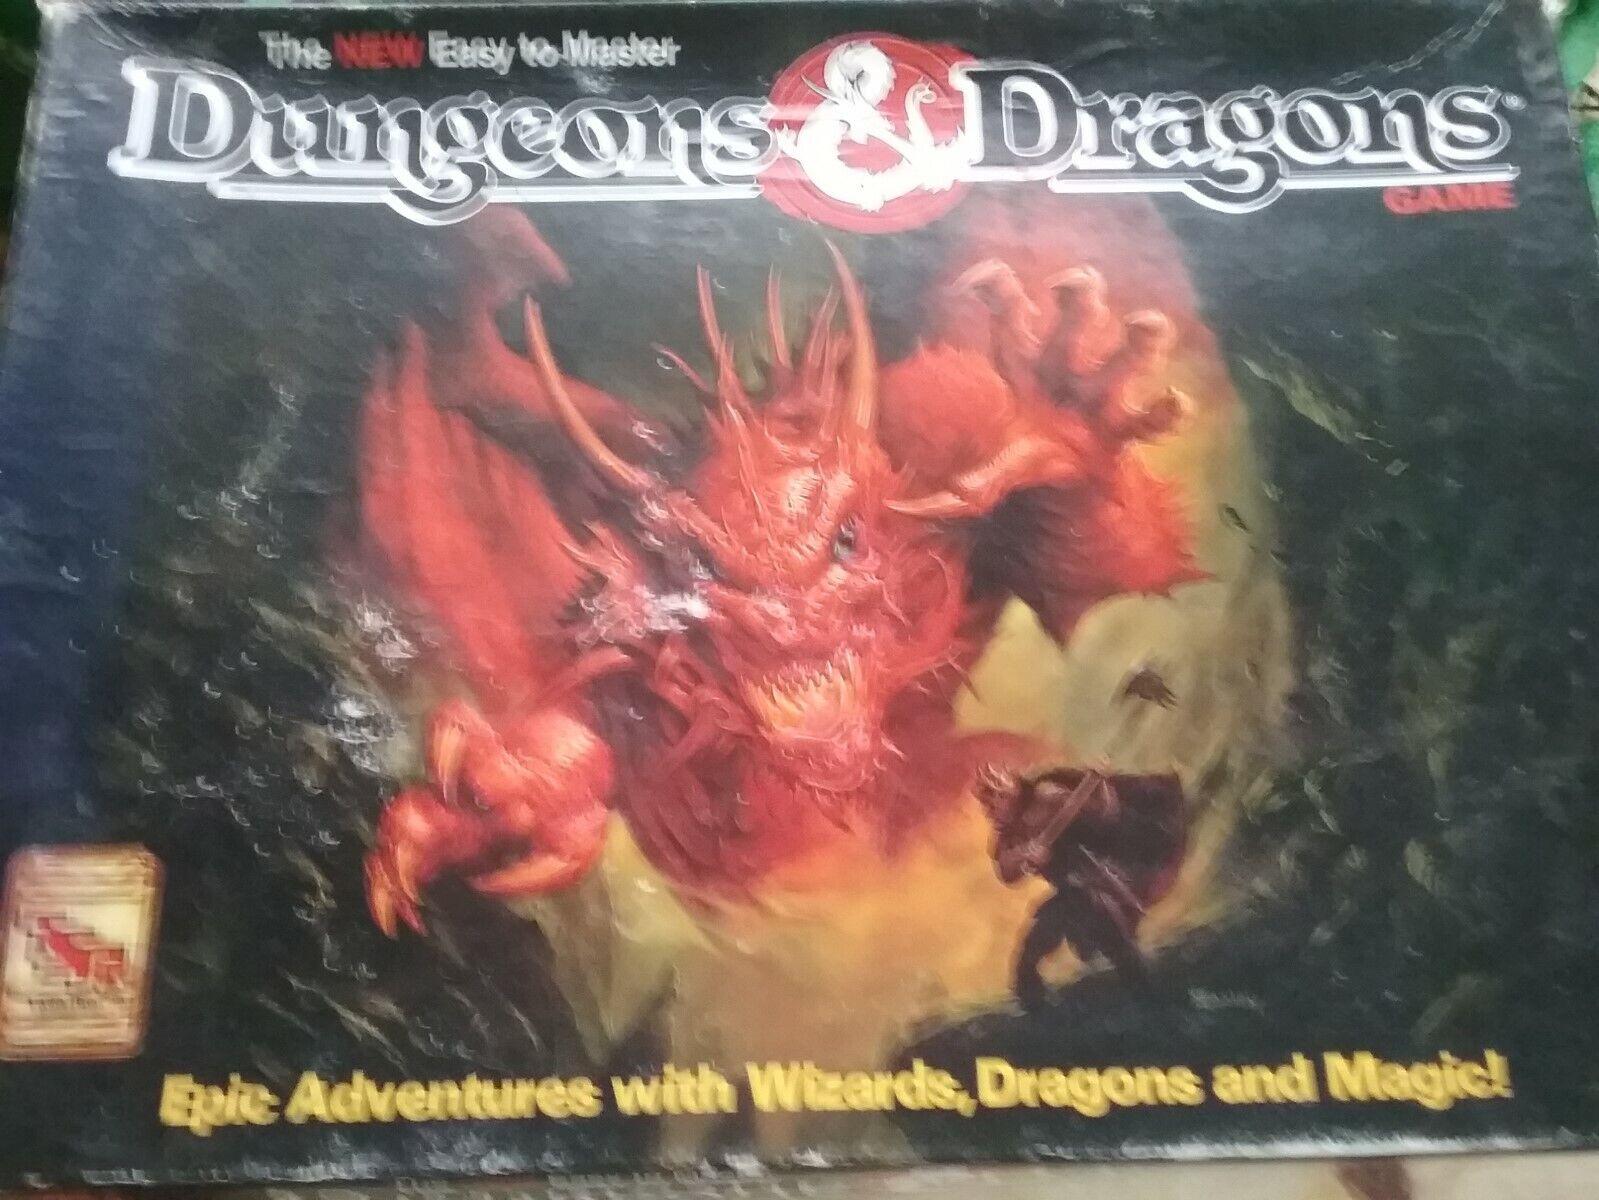 The nuovo Easy to Master Dungeons &  Dragons tavola gioco 1991  alta qualità